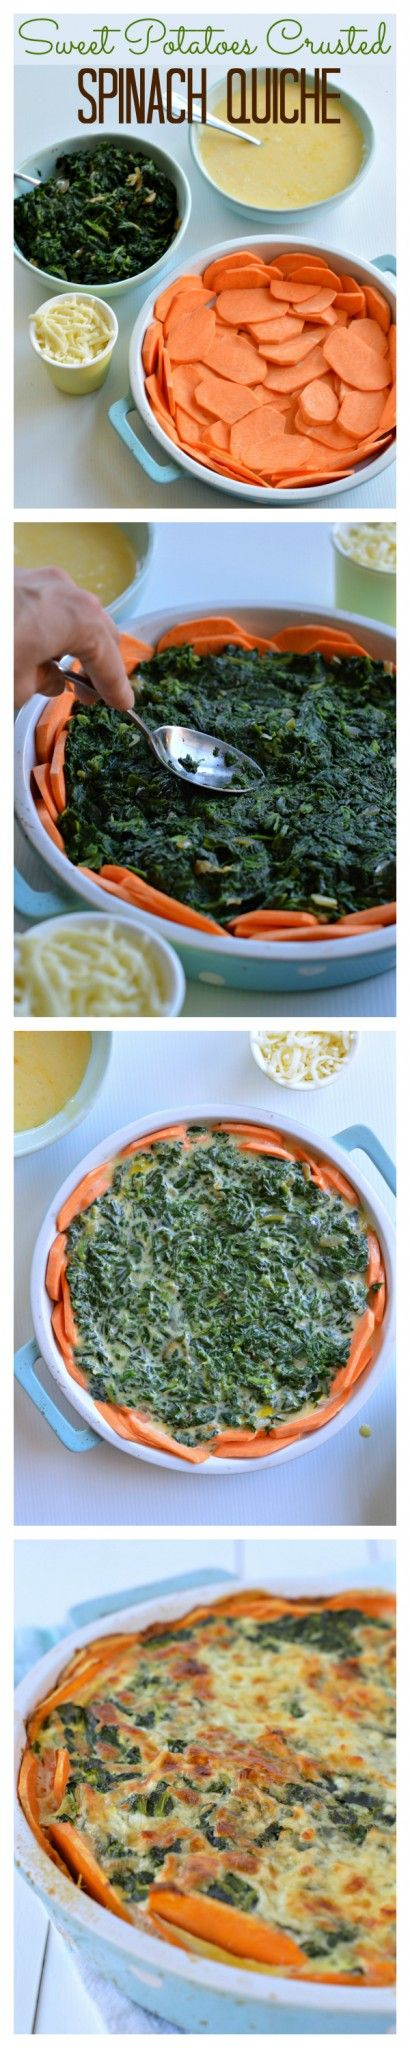 kumara crusted spinach quiche